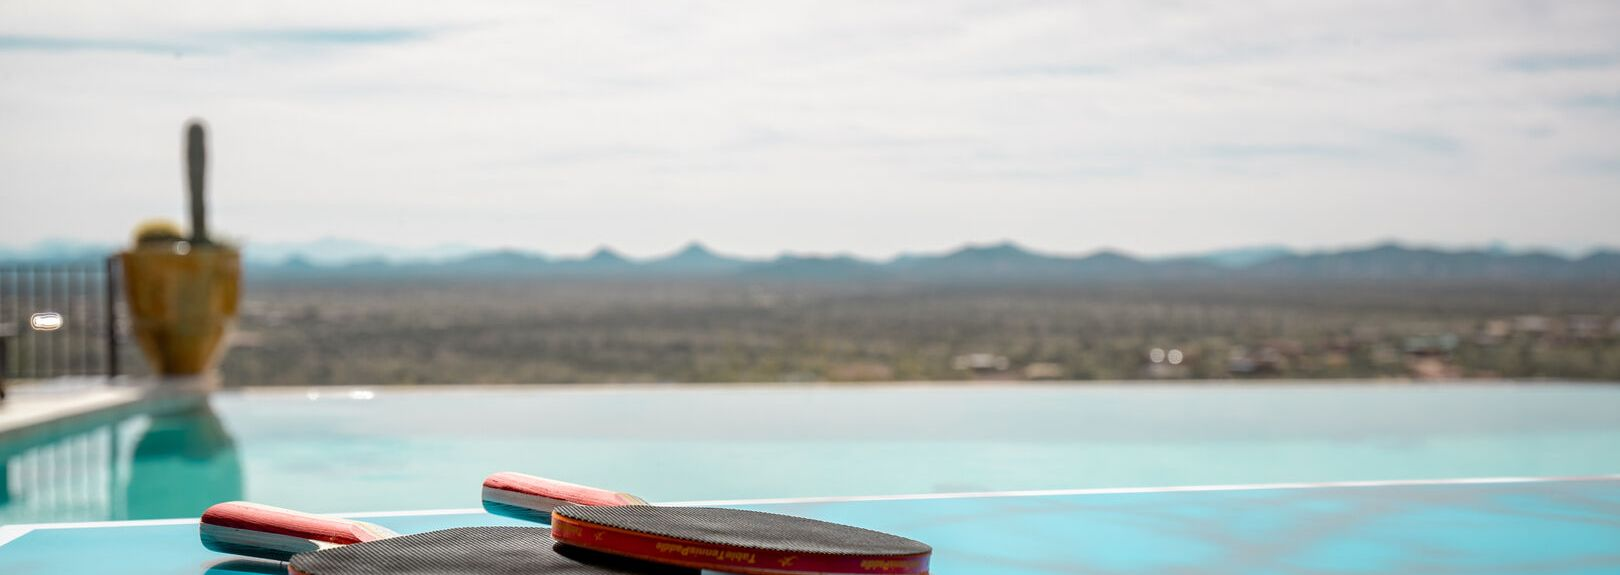 Lake Pleasant Regional Park (puisto), Morristown, Arizona, Yhdysvallat